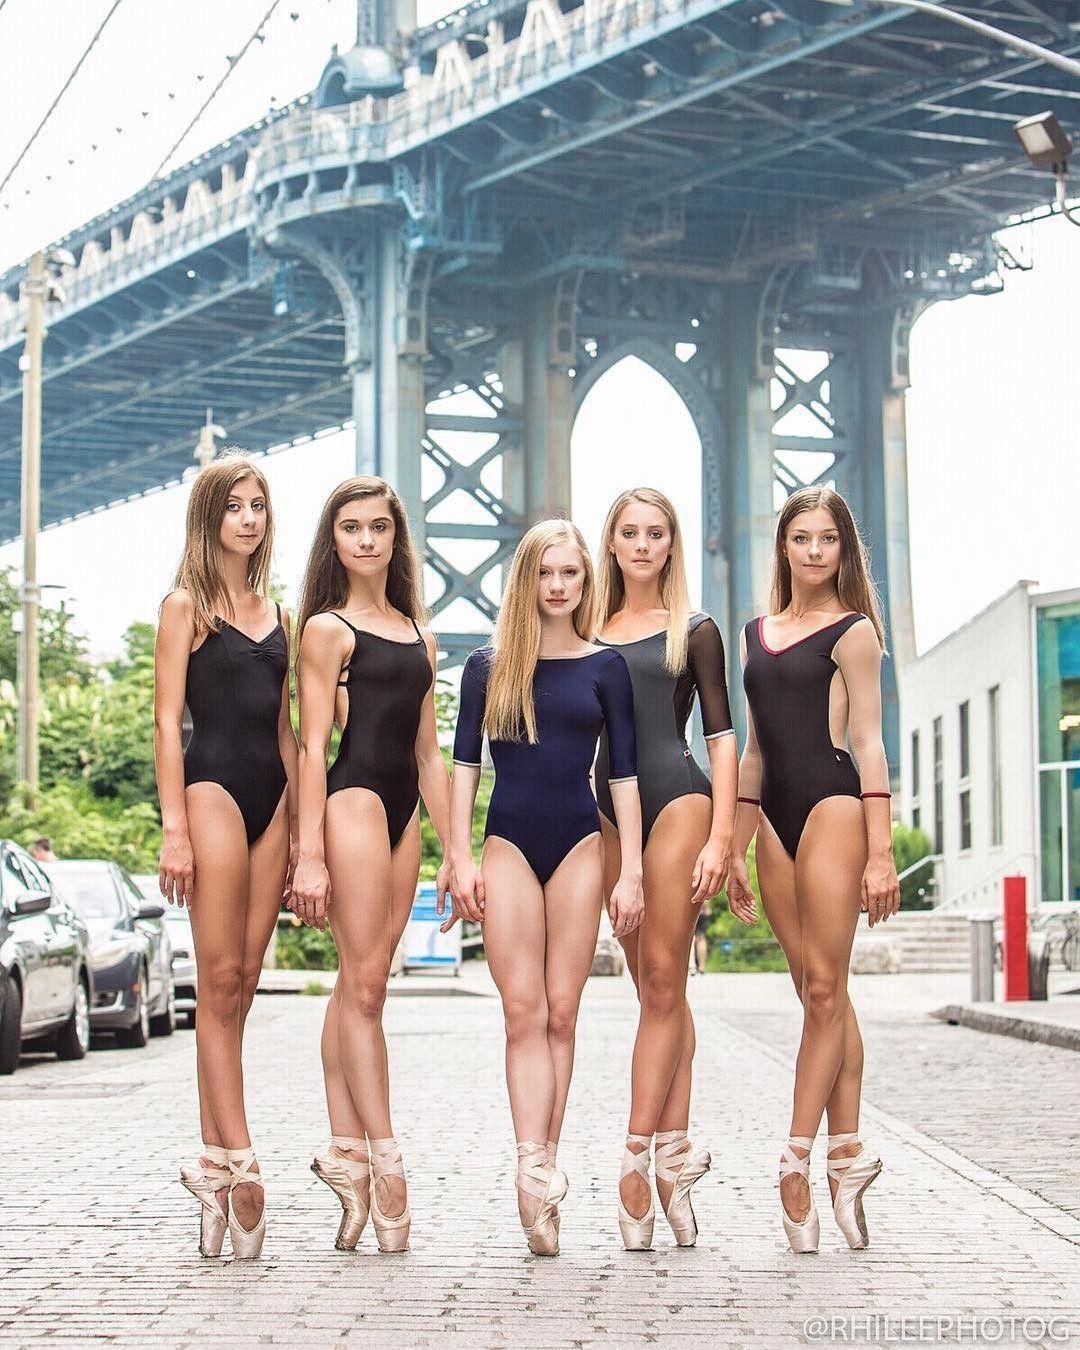 Ballet poses, Ballet photography, Dance